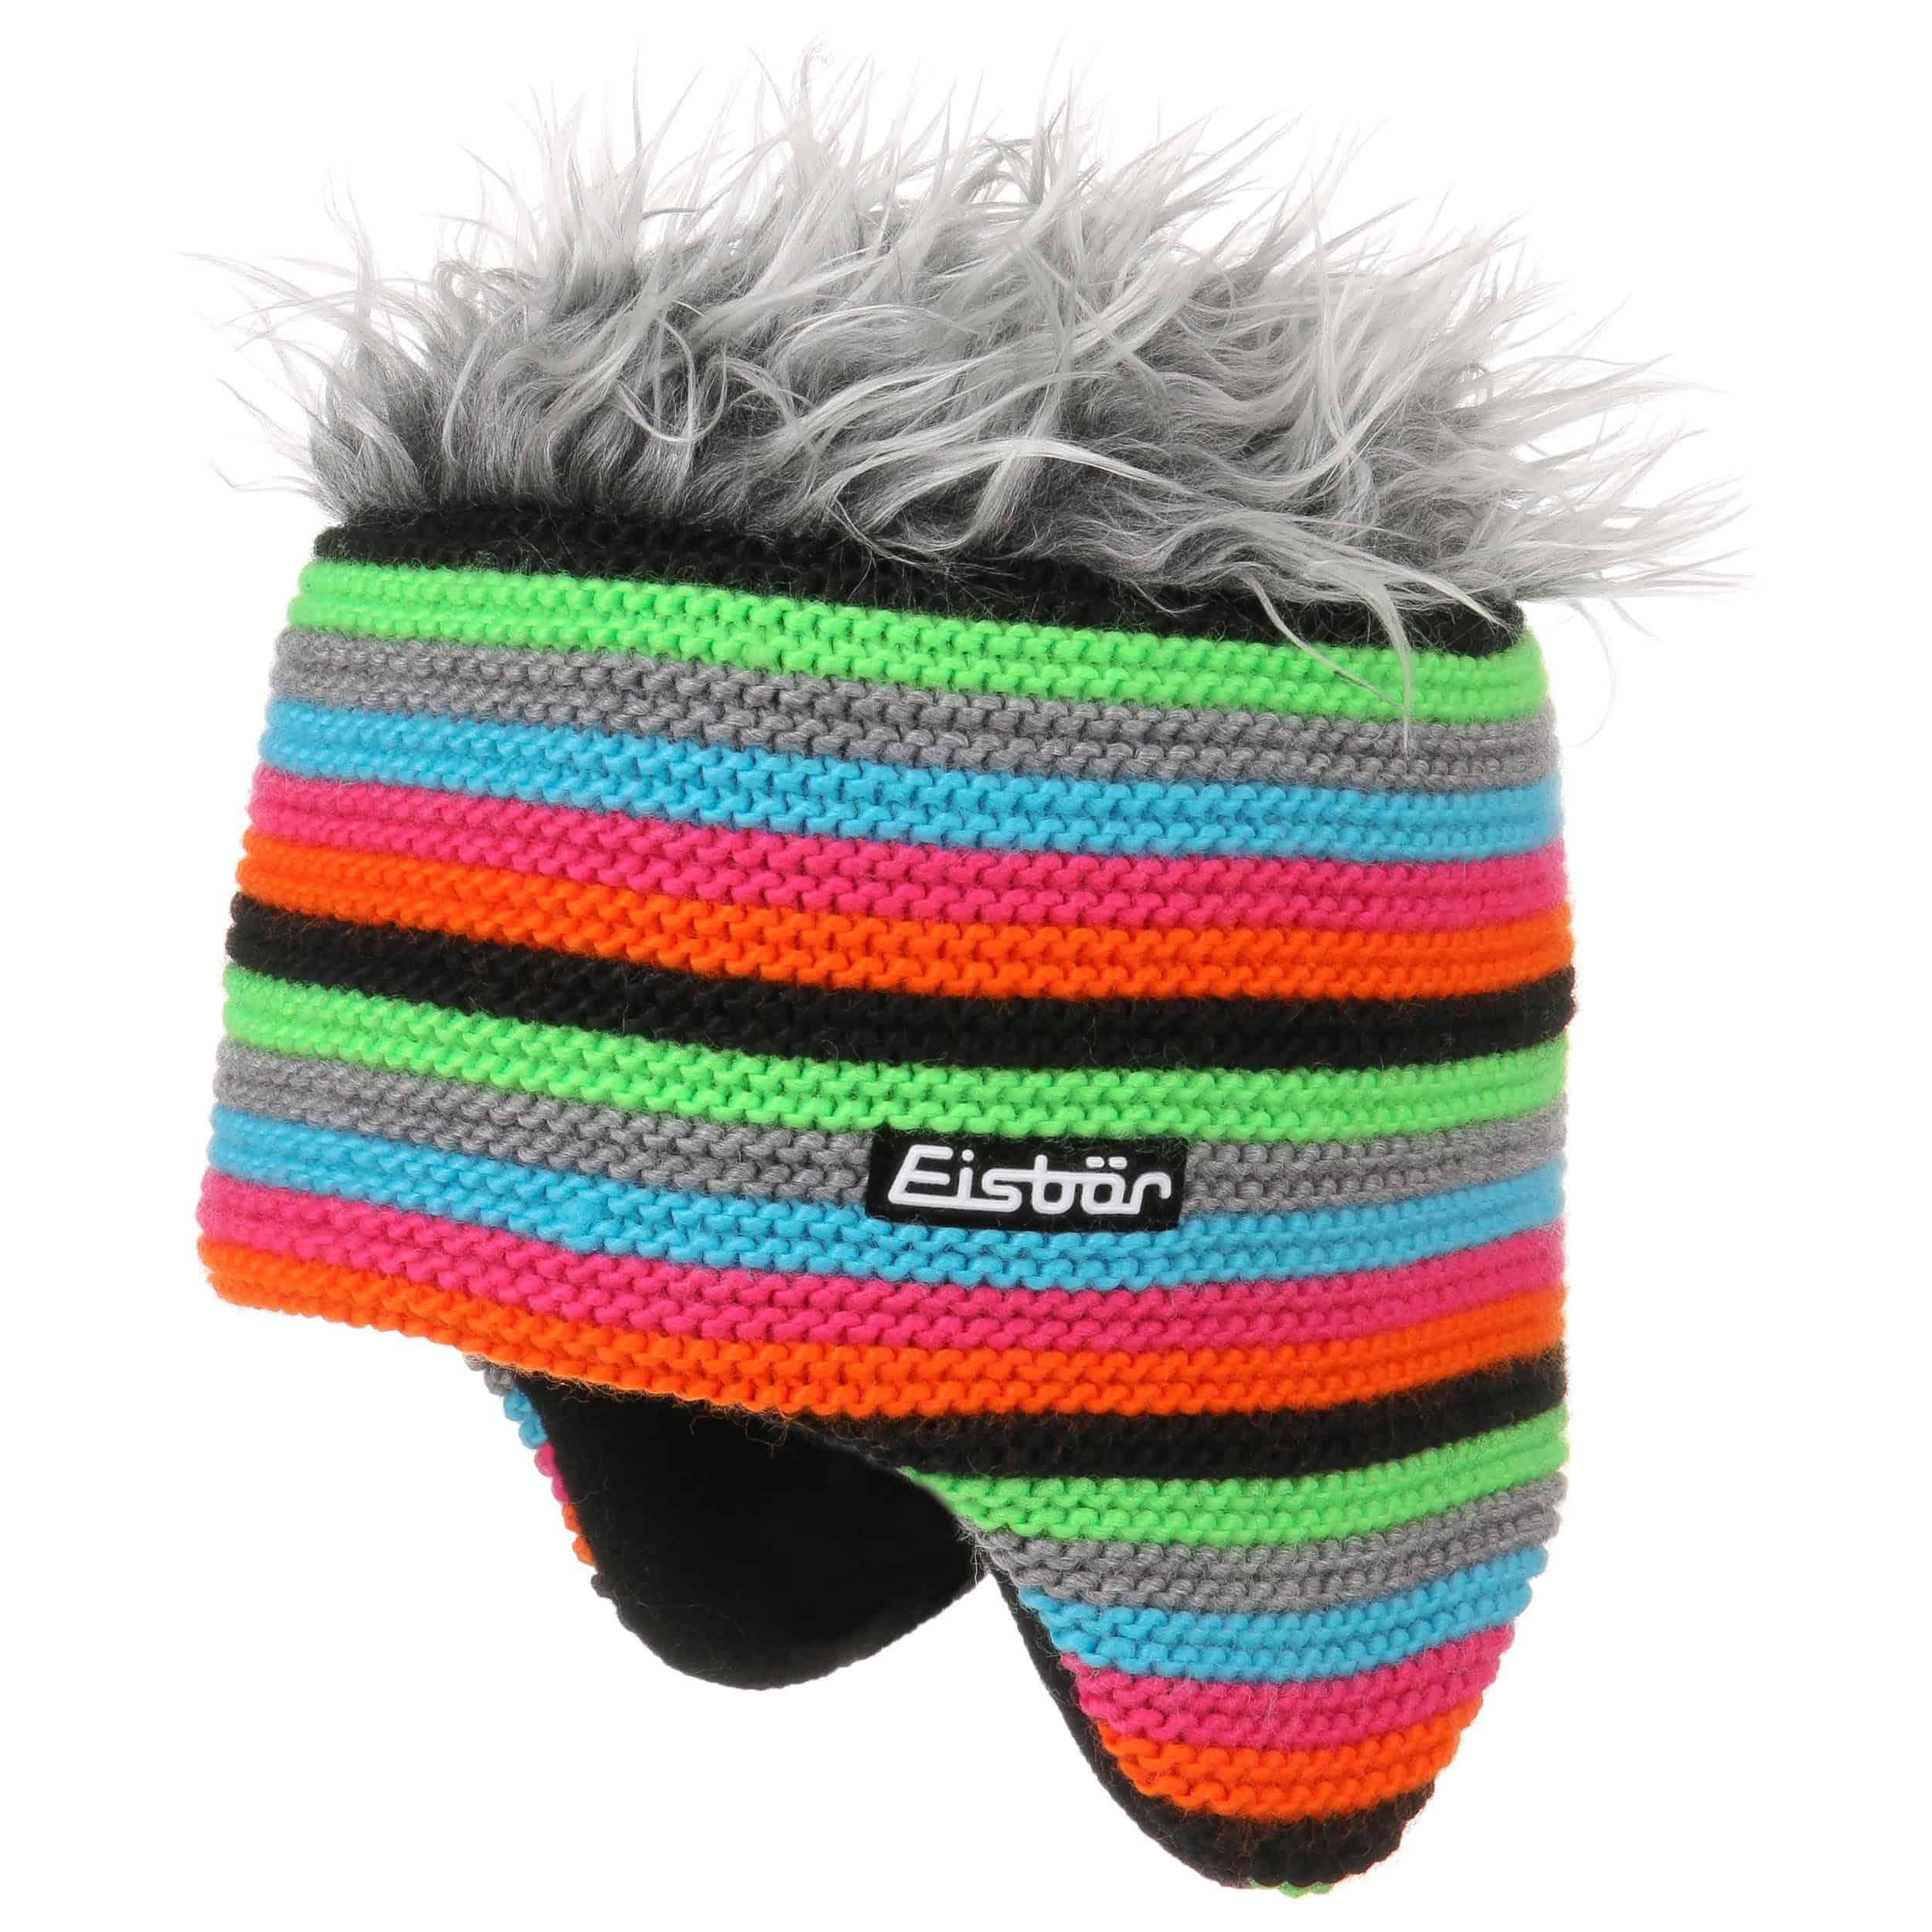 eeb96abbec4 ... Funky Cocker Knit Hat by Eisbär - black 4 ...